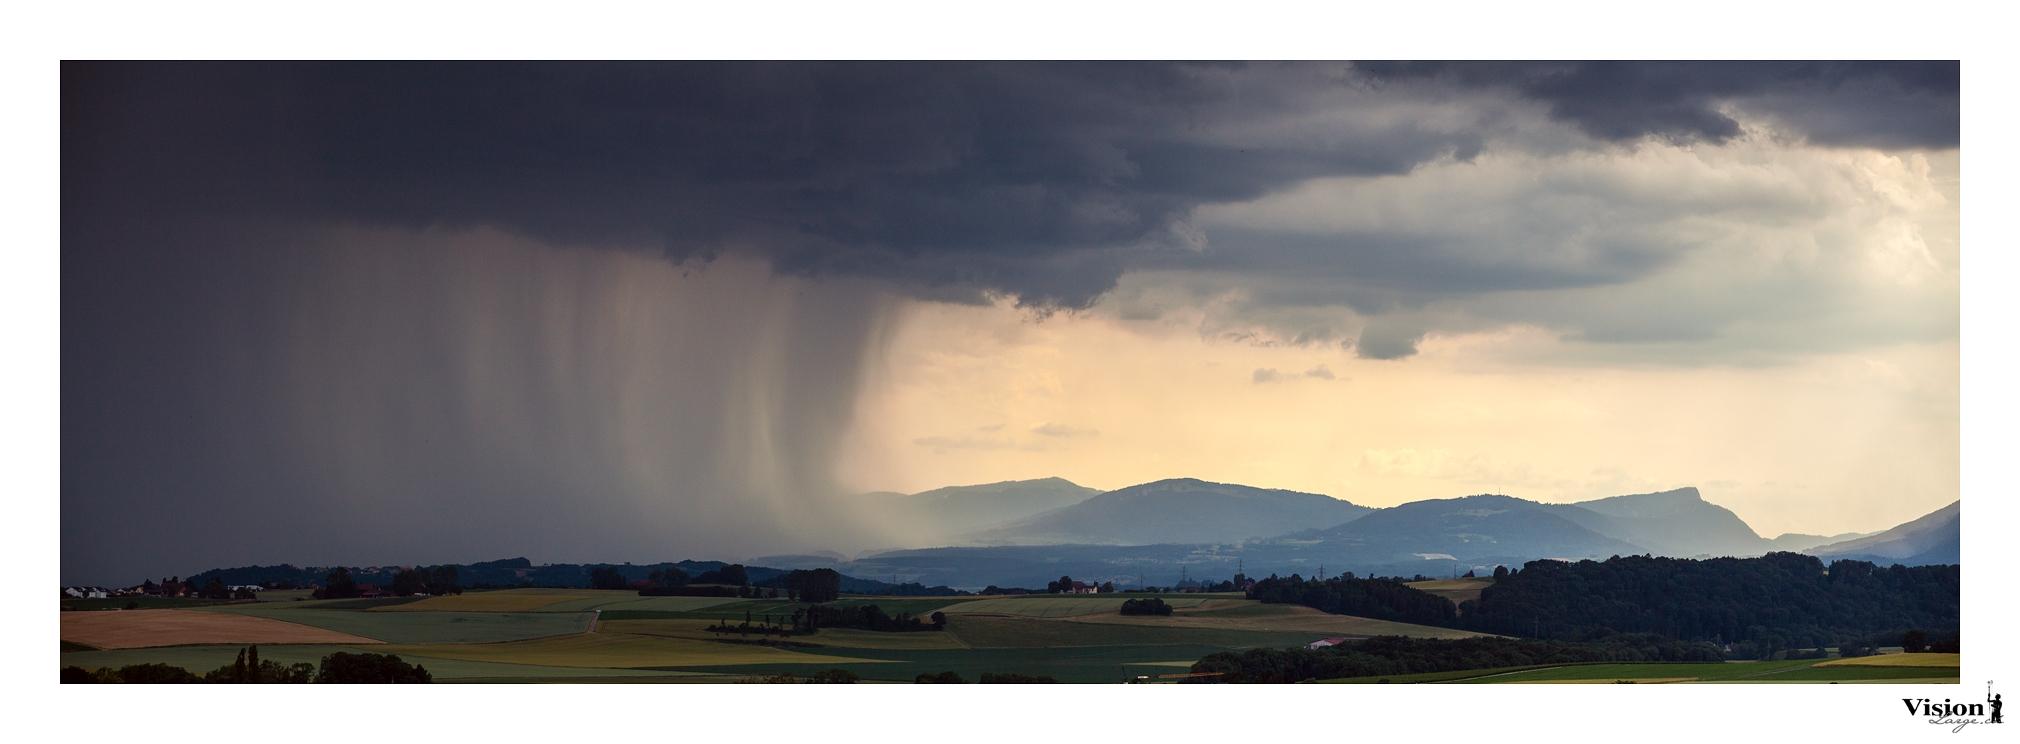 orage suisse vaud